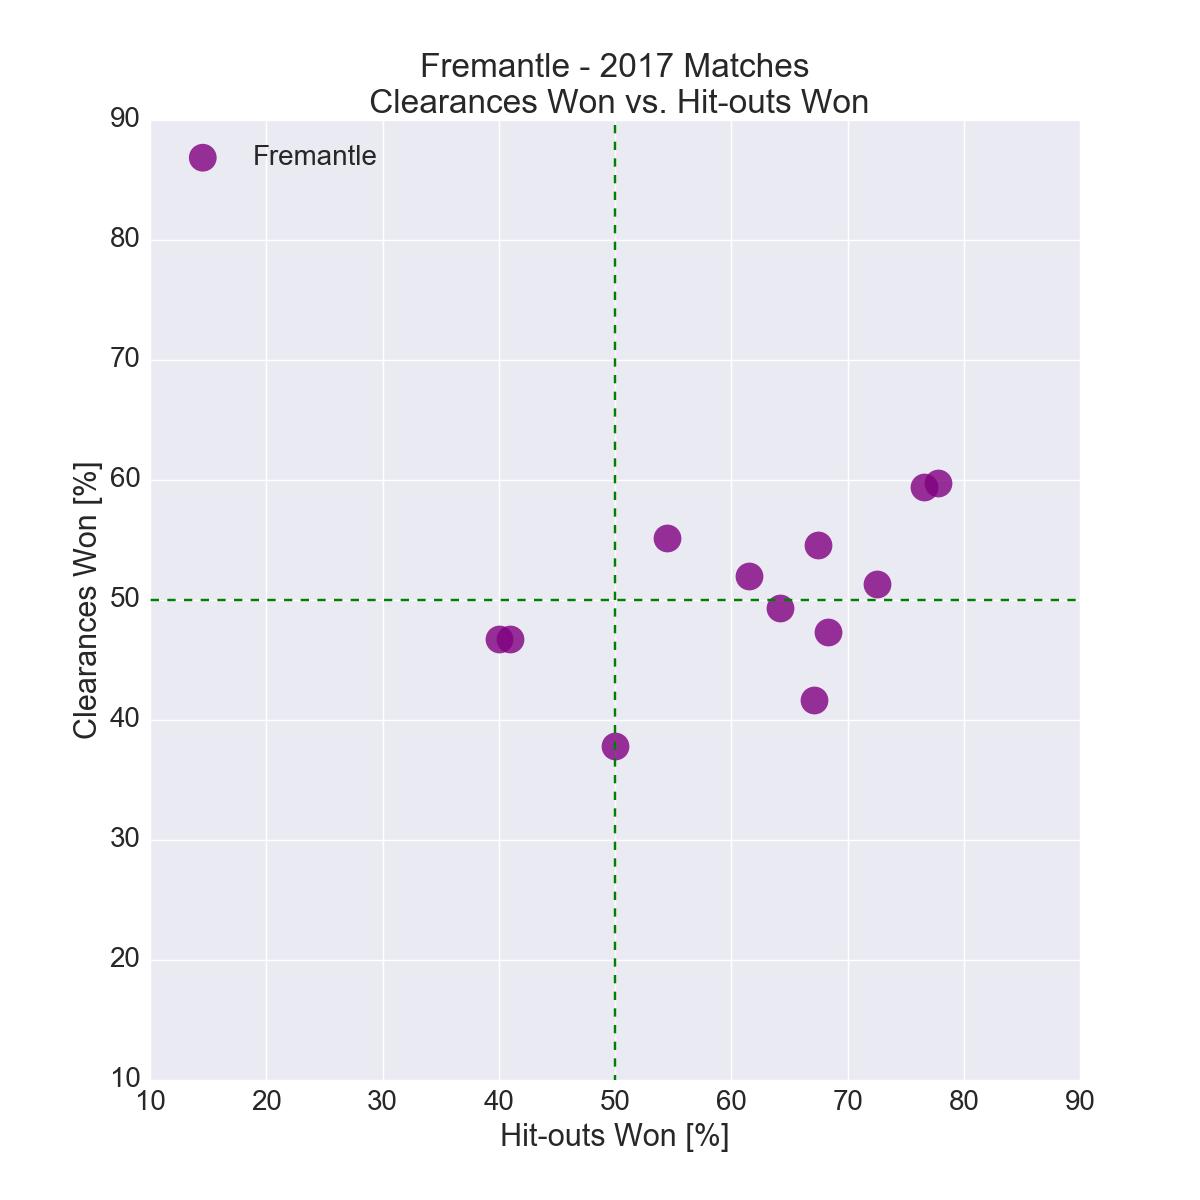 Figure-9: Fremantle in 2017 – Clearances Won vs. Hit-outs Won